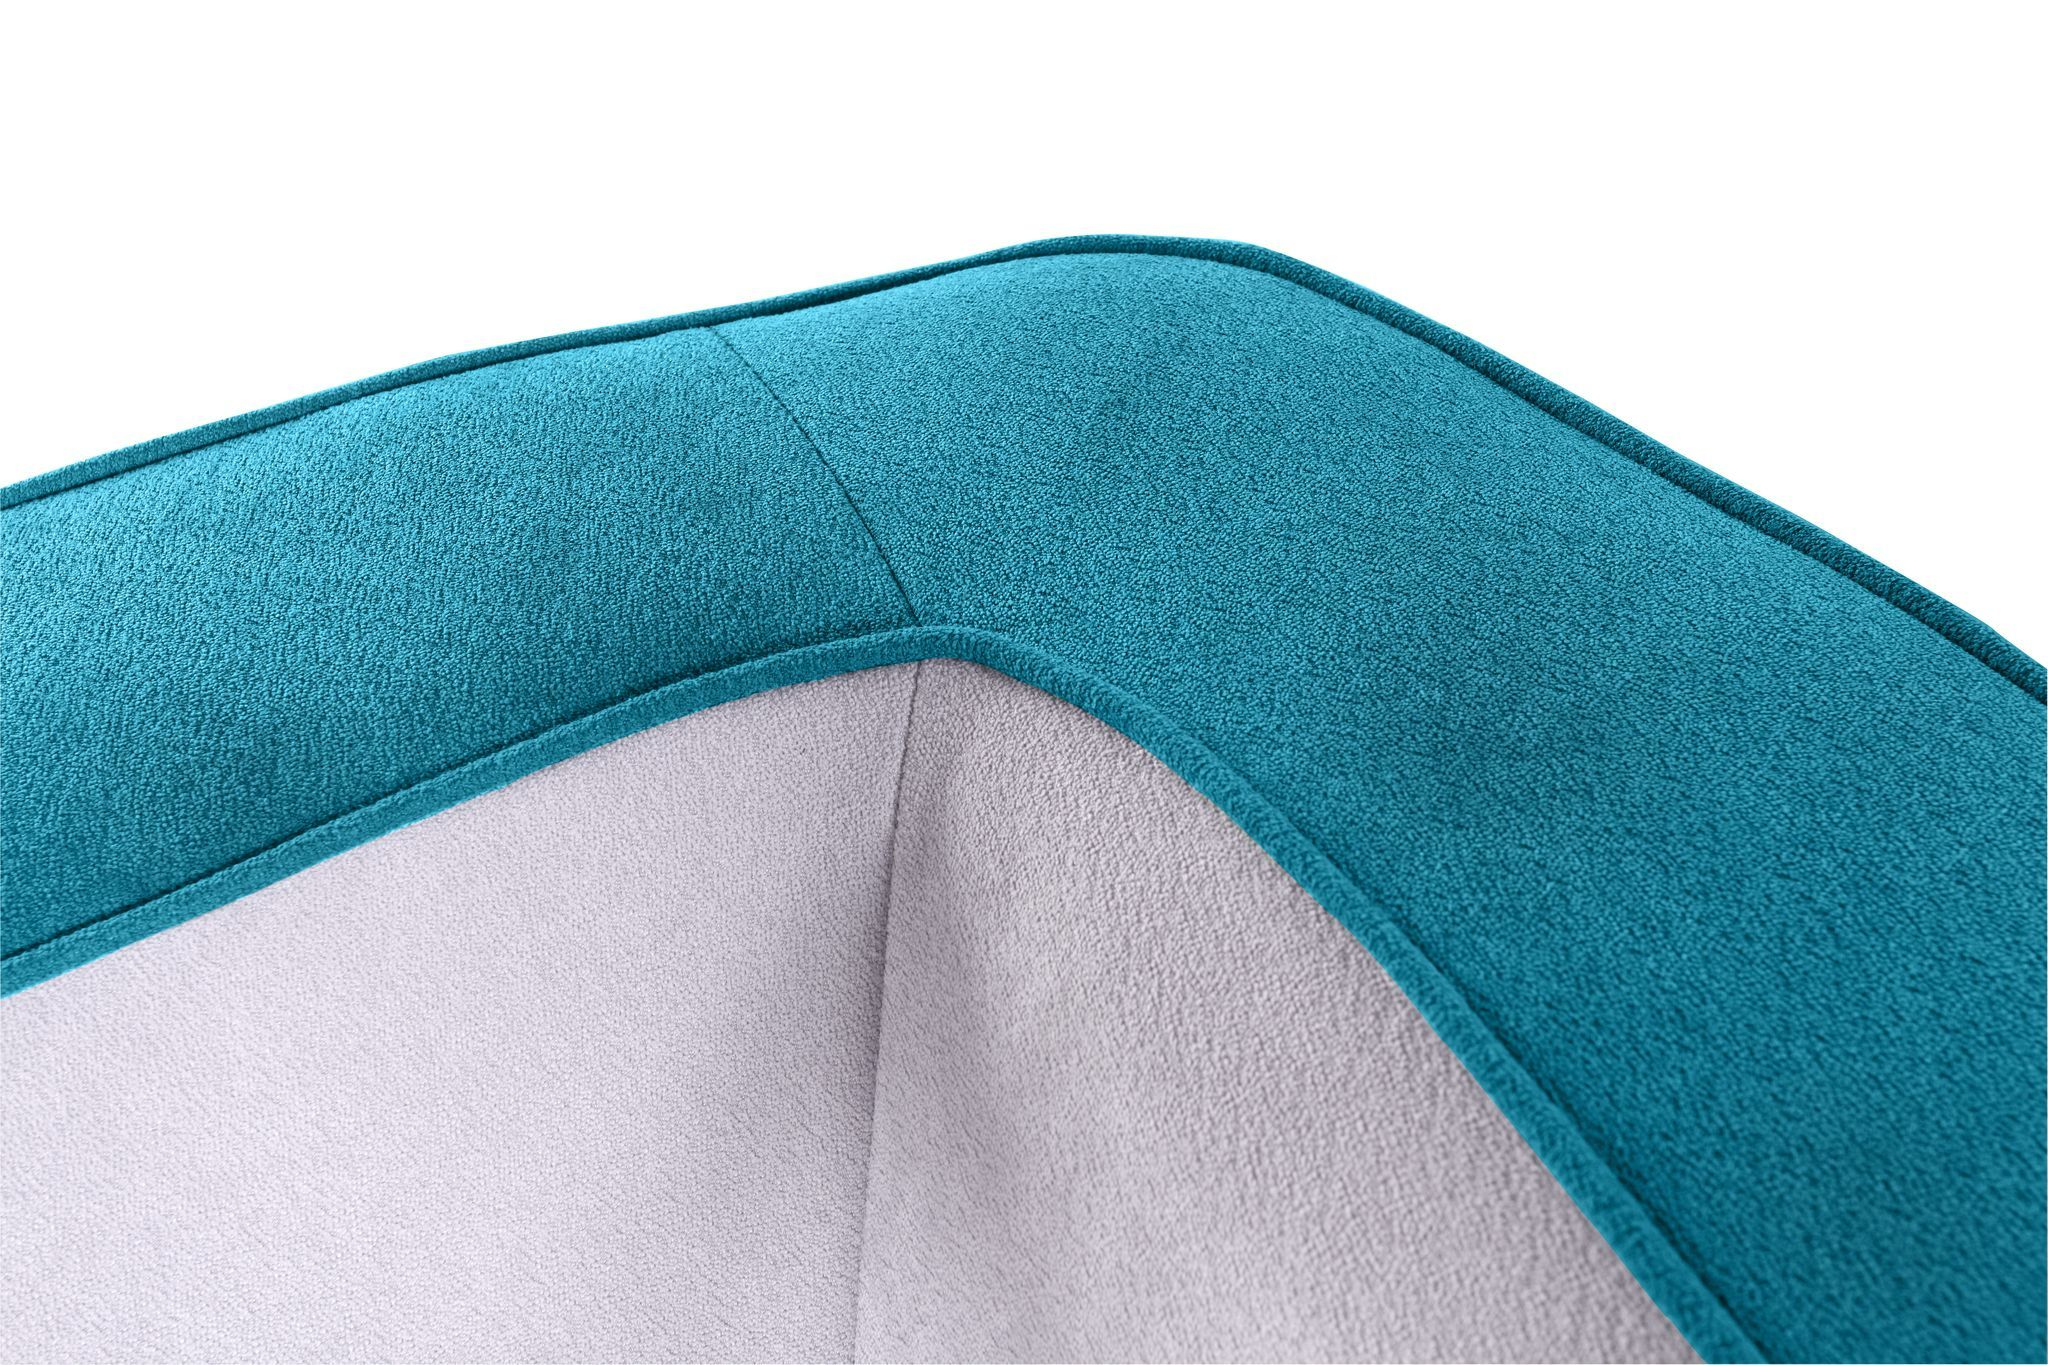 BUMP Convertible : Sofa XL - Disponible en 3 coloris